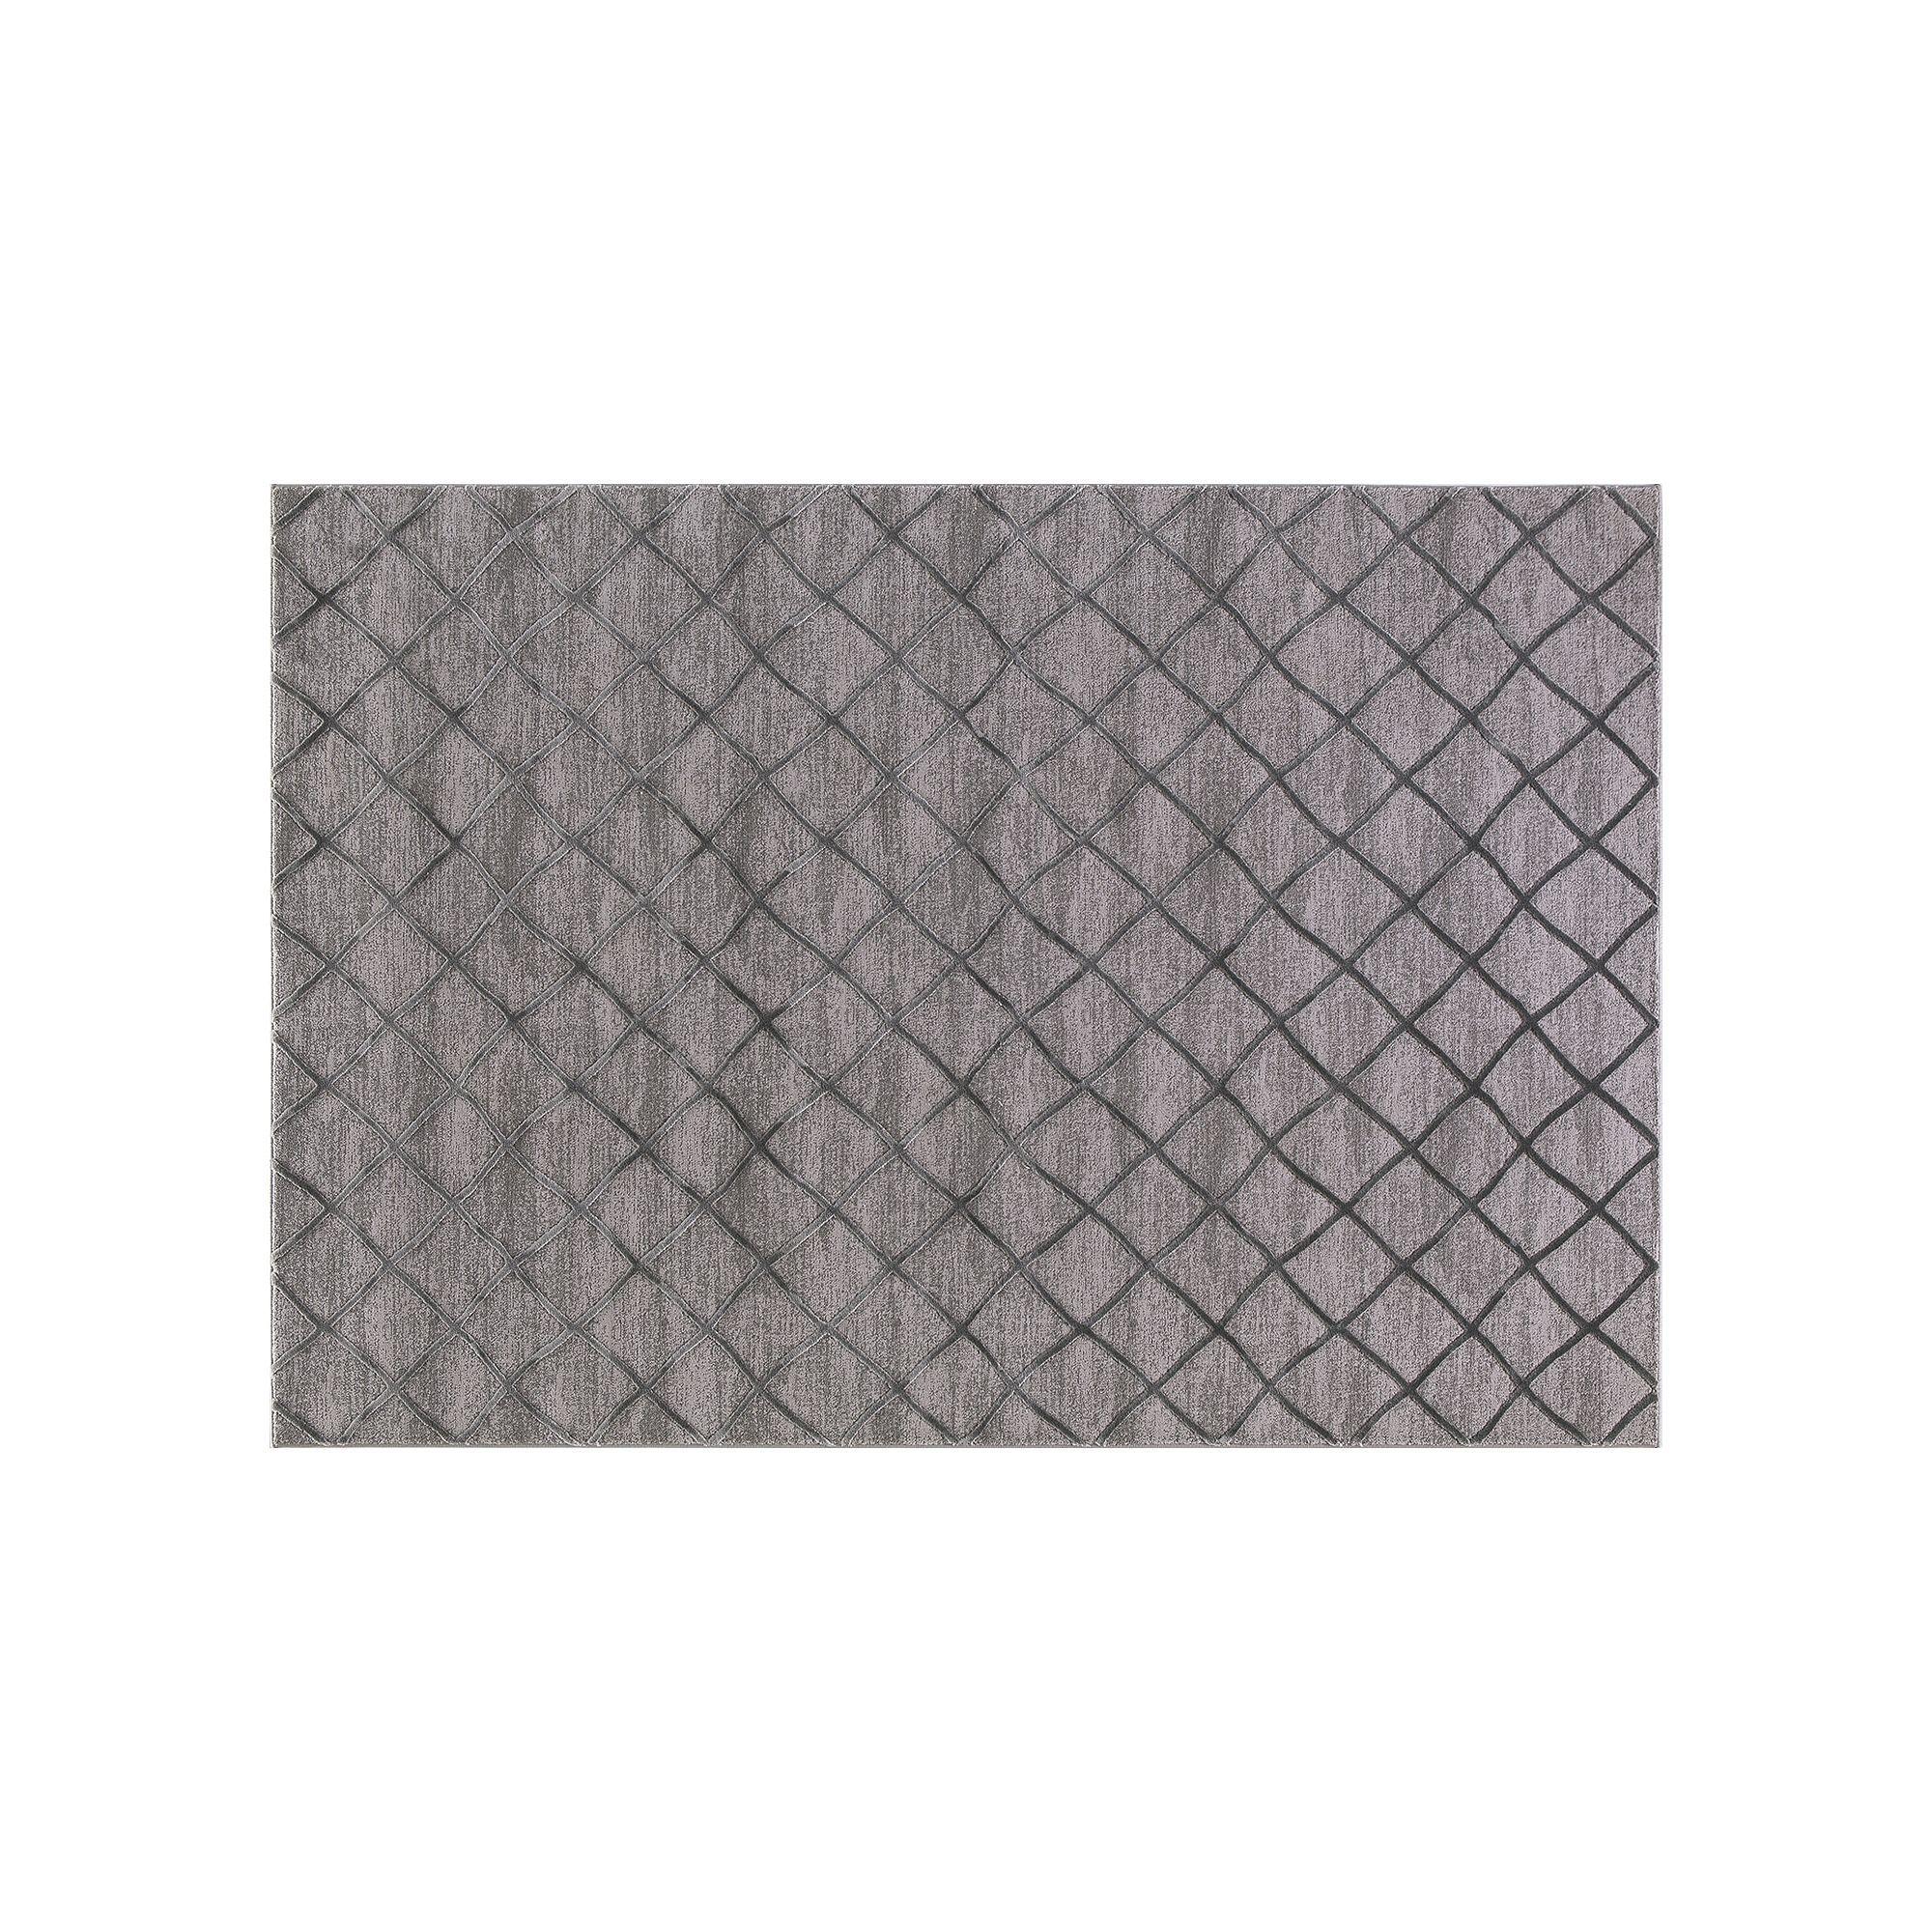 Best Concord Global Thema Teo Lattice Rug Grey Durable Rugs 400 x 300